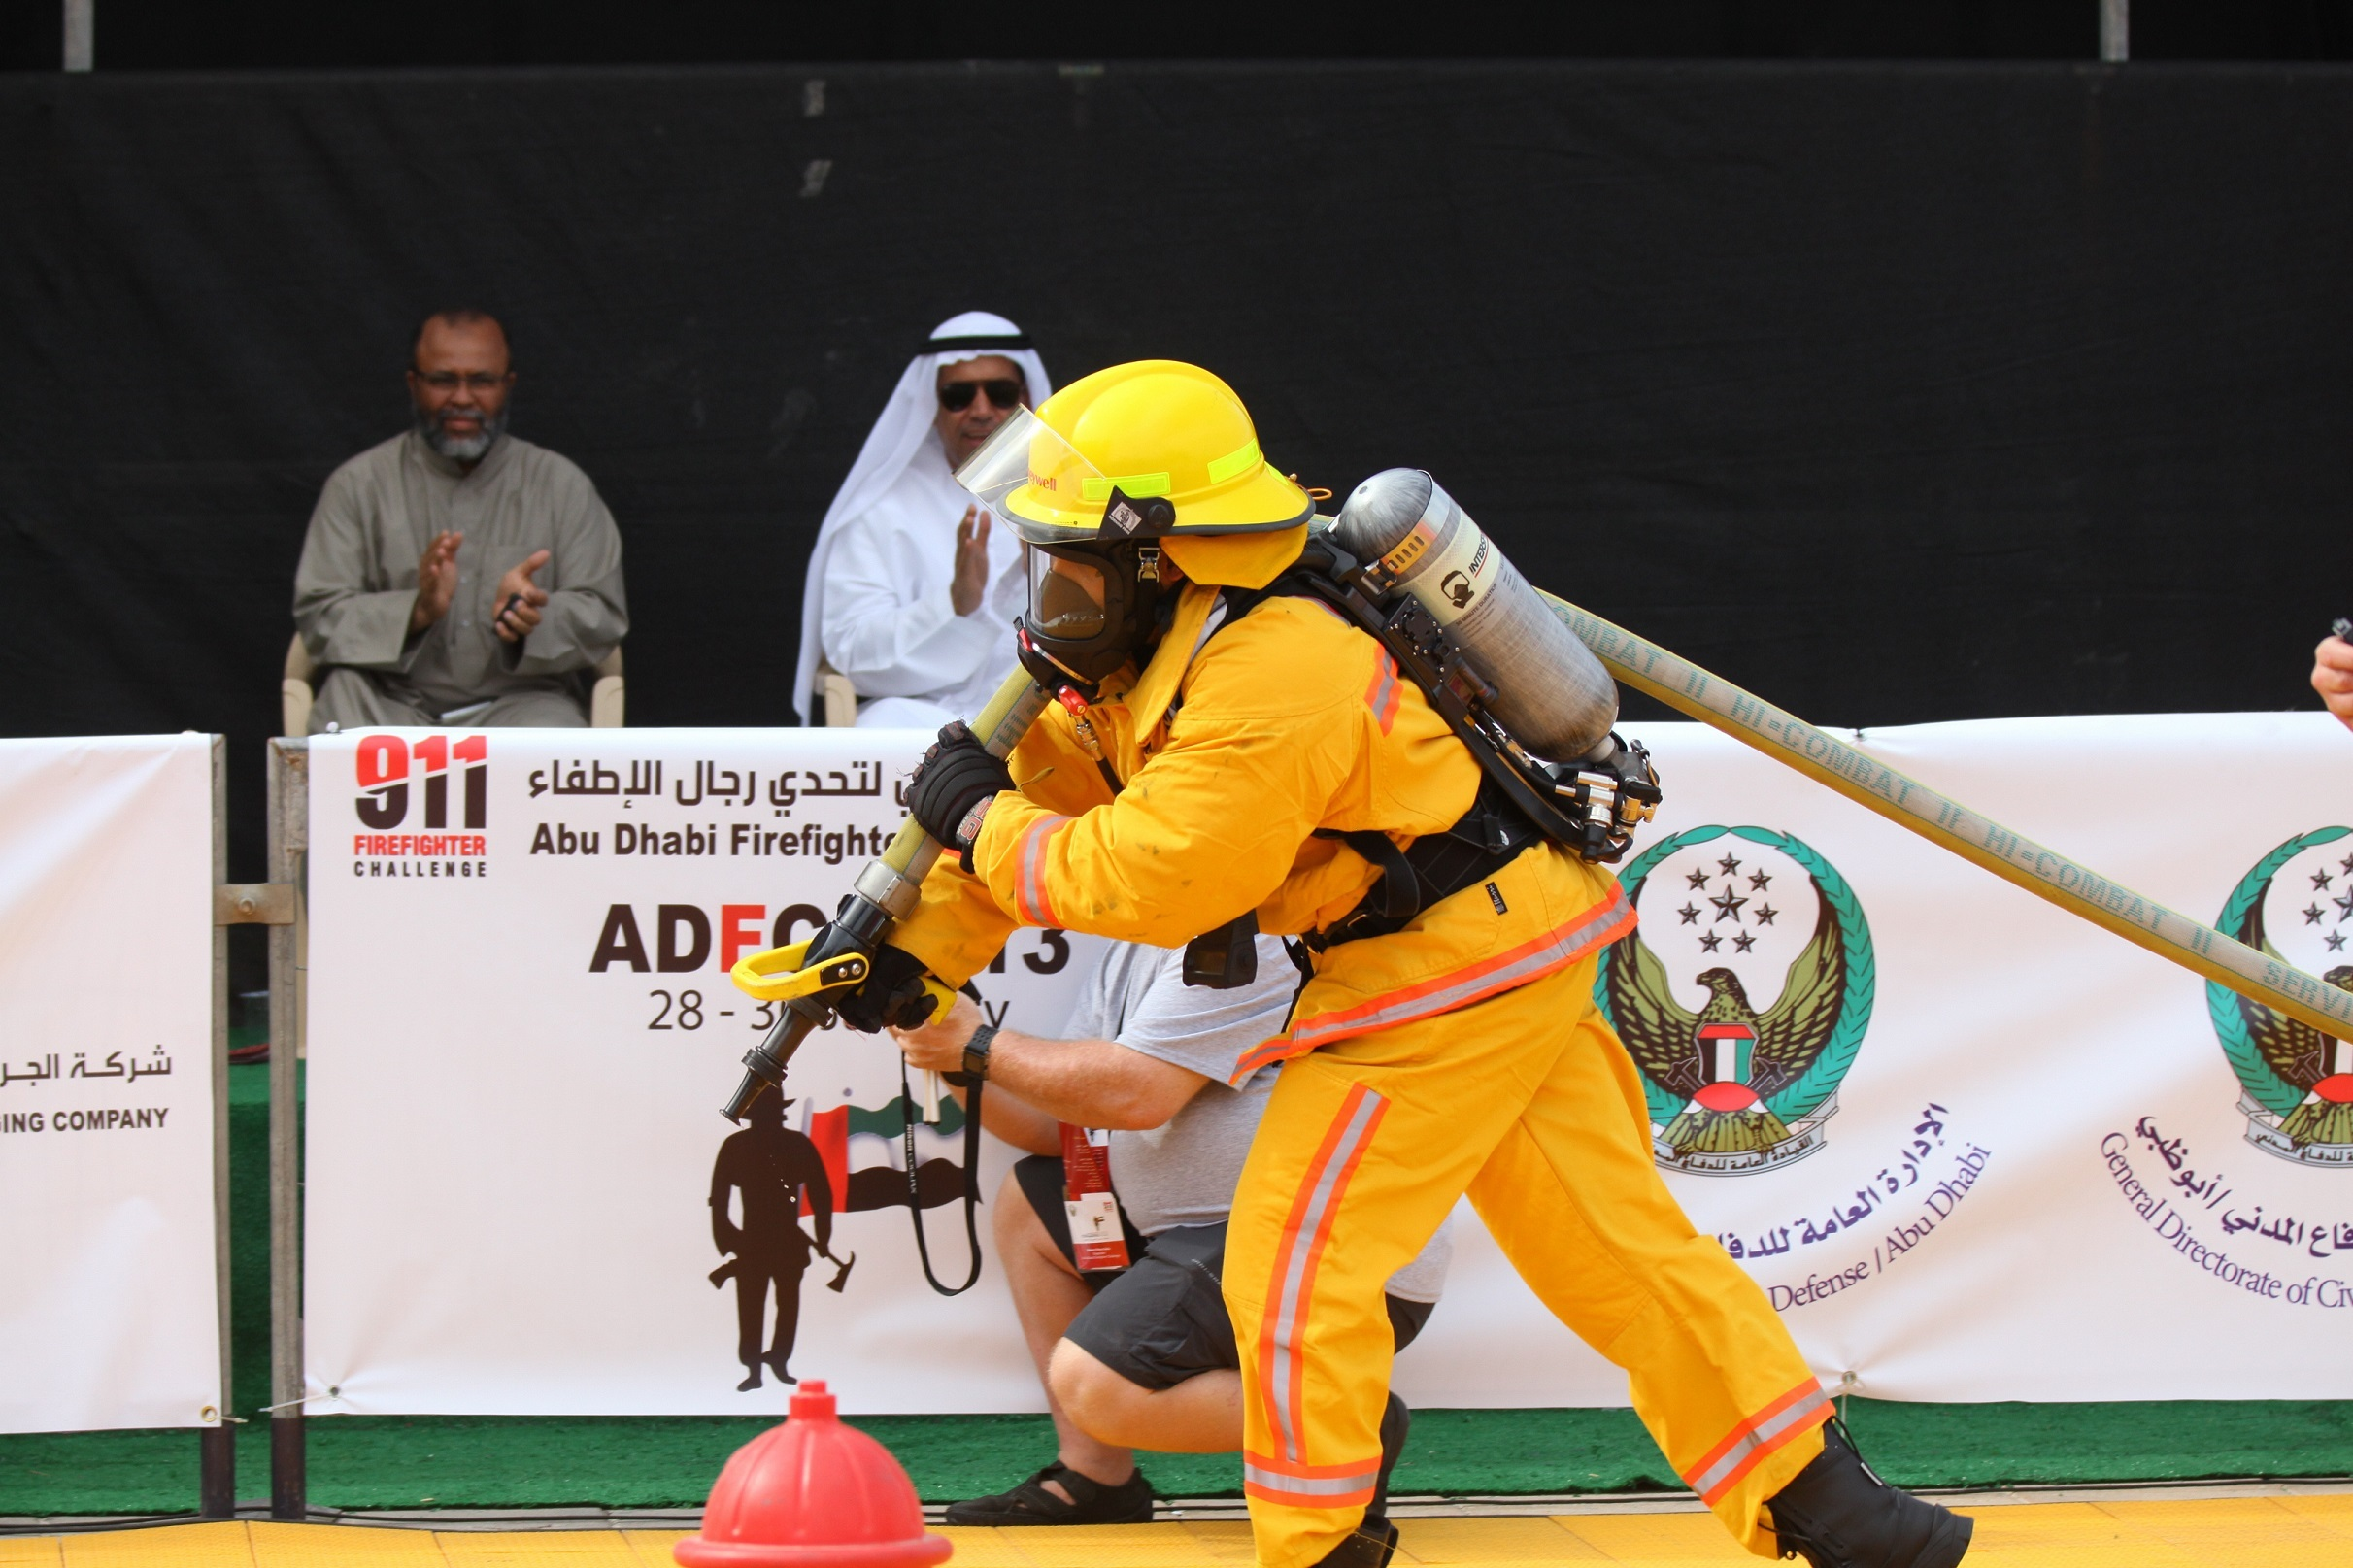 UAE International Fire-fighter Challenge 2014 (Photo: Business Wire)